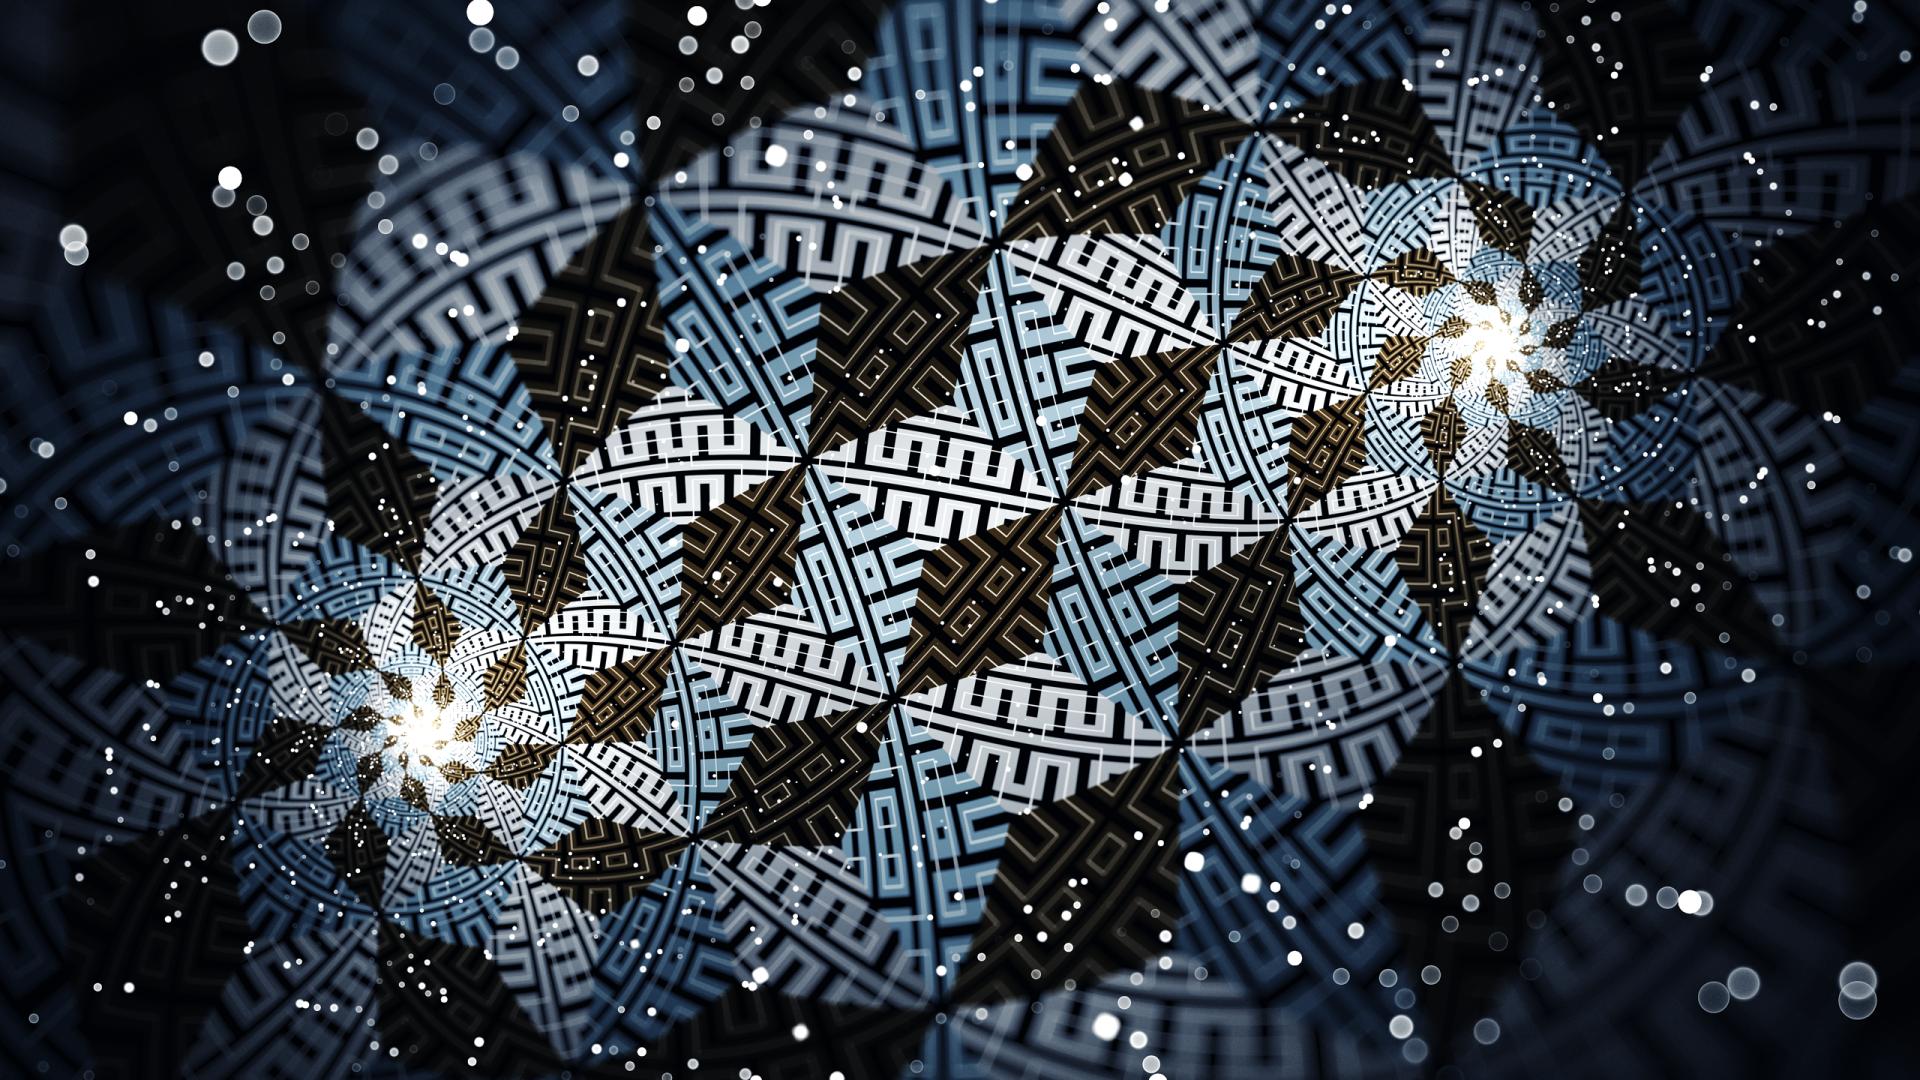 Abstract - Fractal  Artistic Pattern Spiral Wallpaper